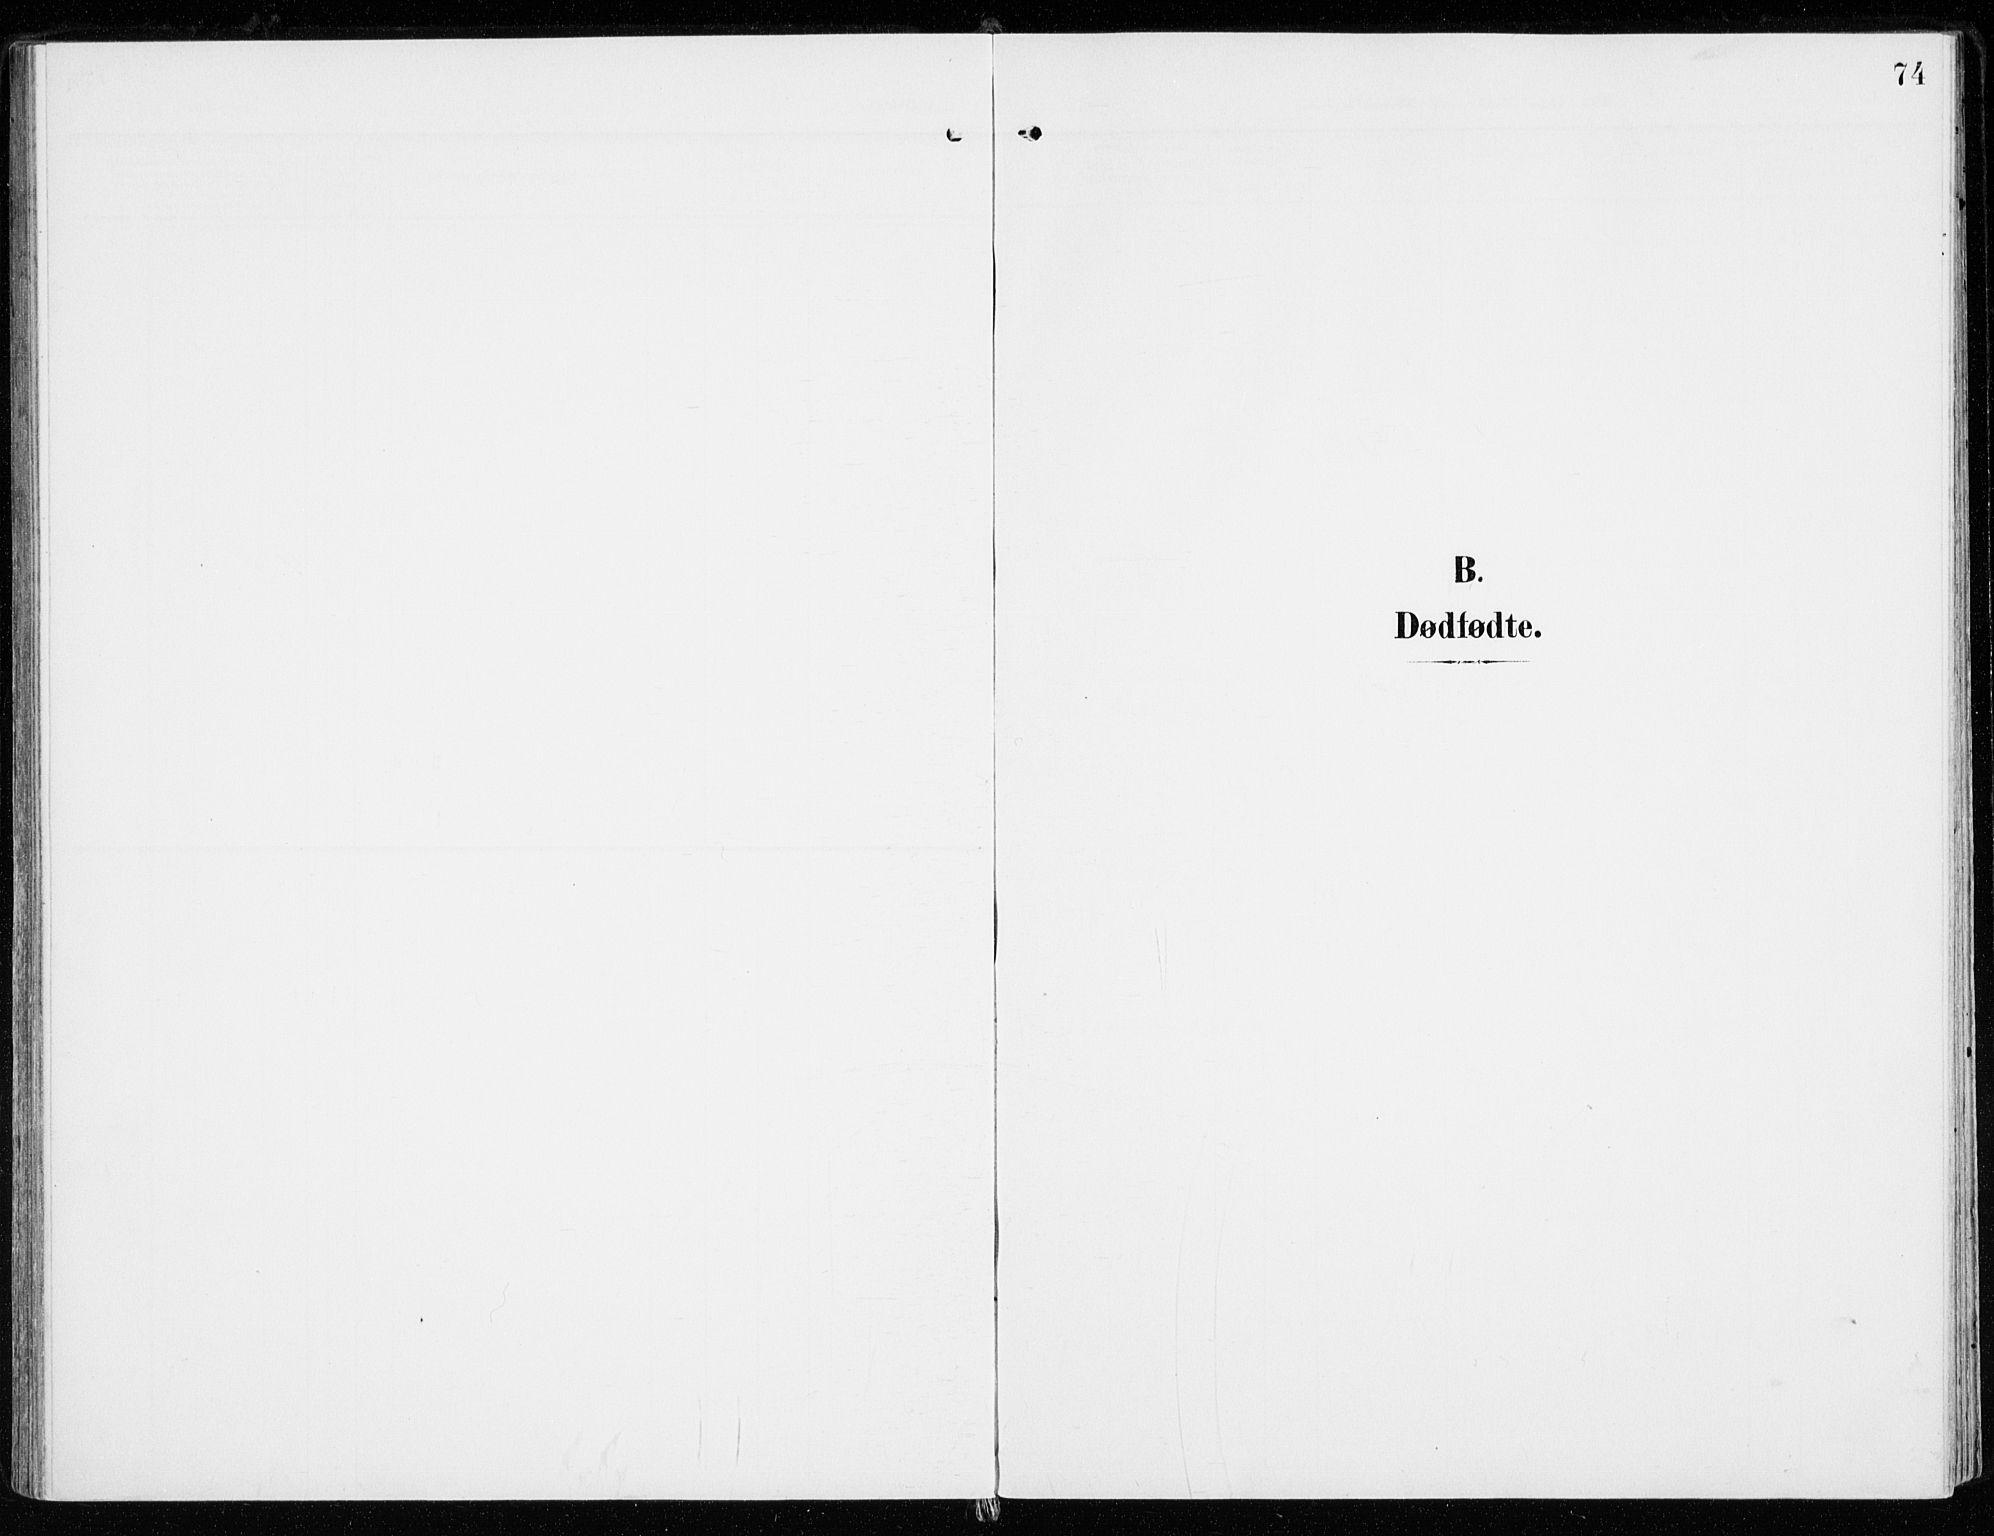 SAH, Sel prestekontor, Ministerialbok nr. 2, 1905-1919, s. 74